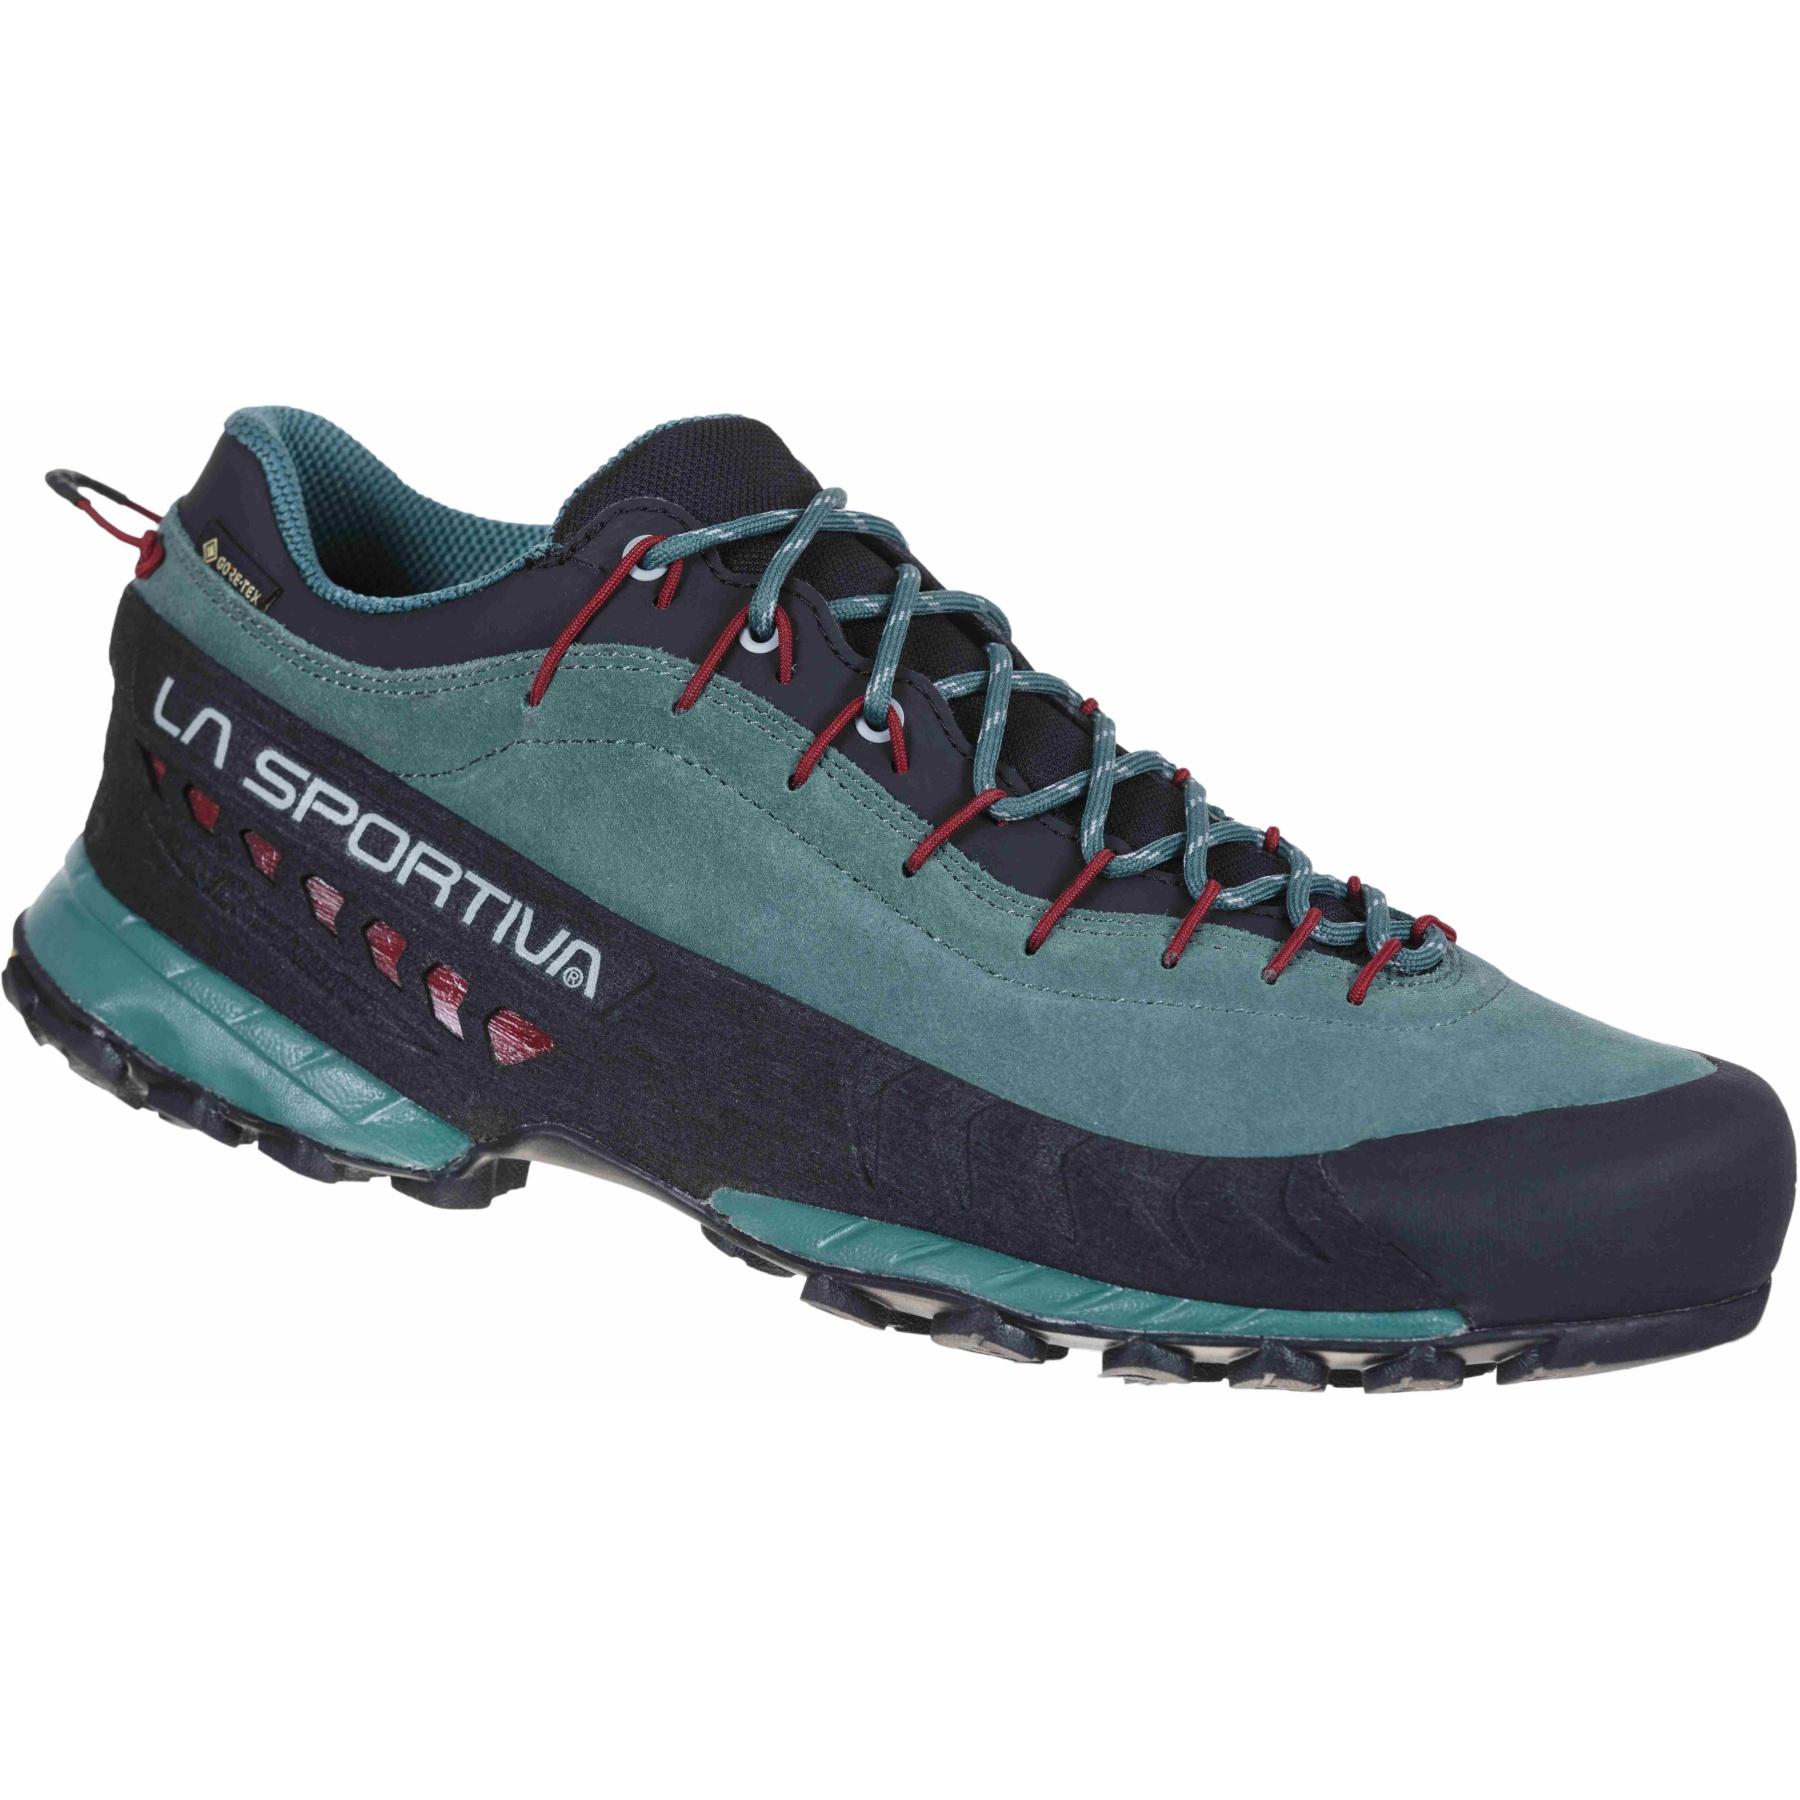 La Sportiva TX4 GTX Approach Shoes - Pine/Chili